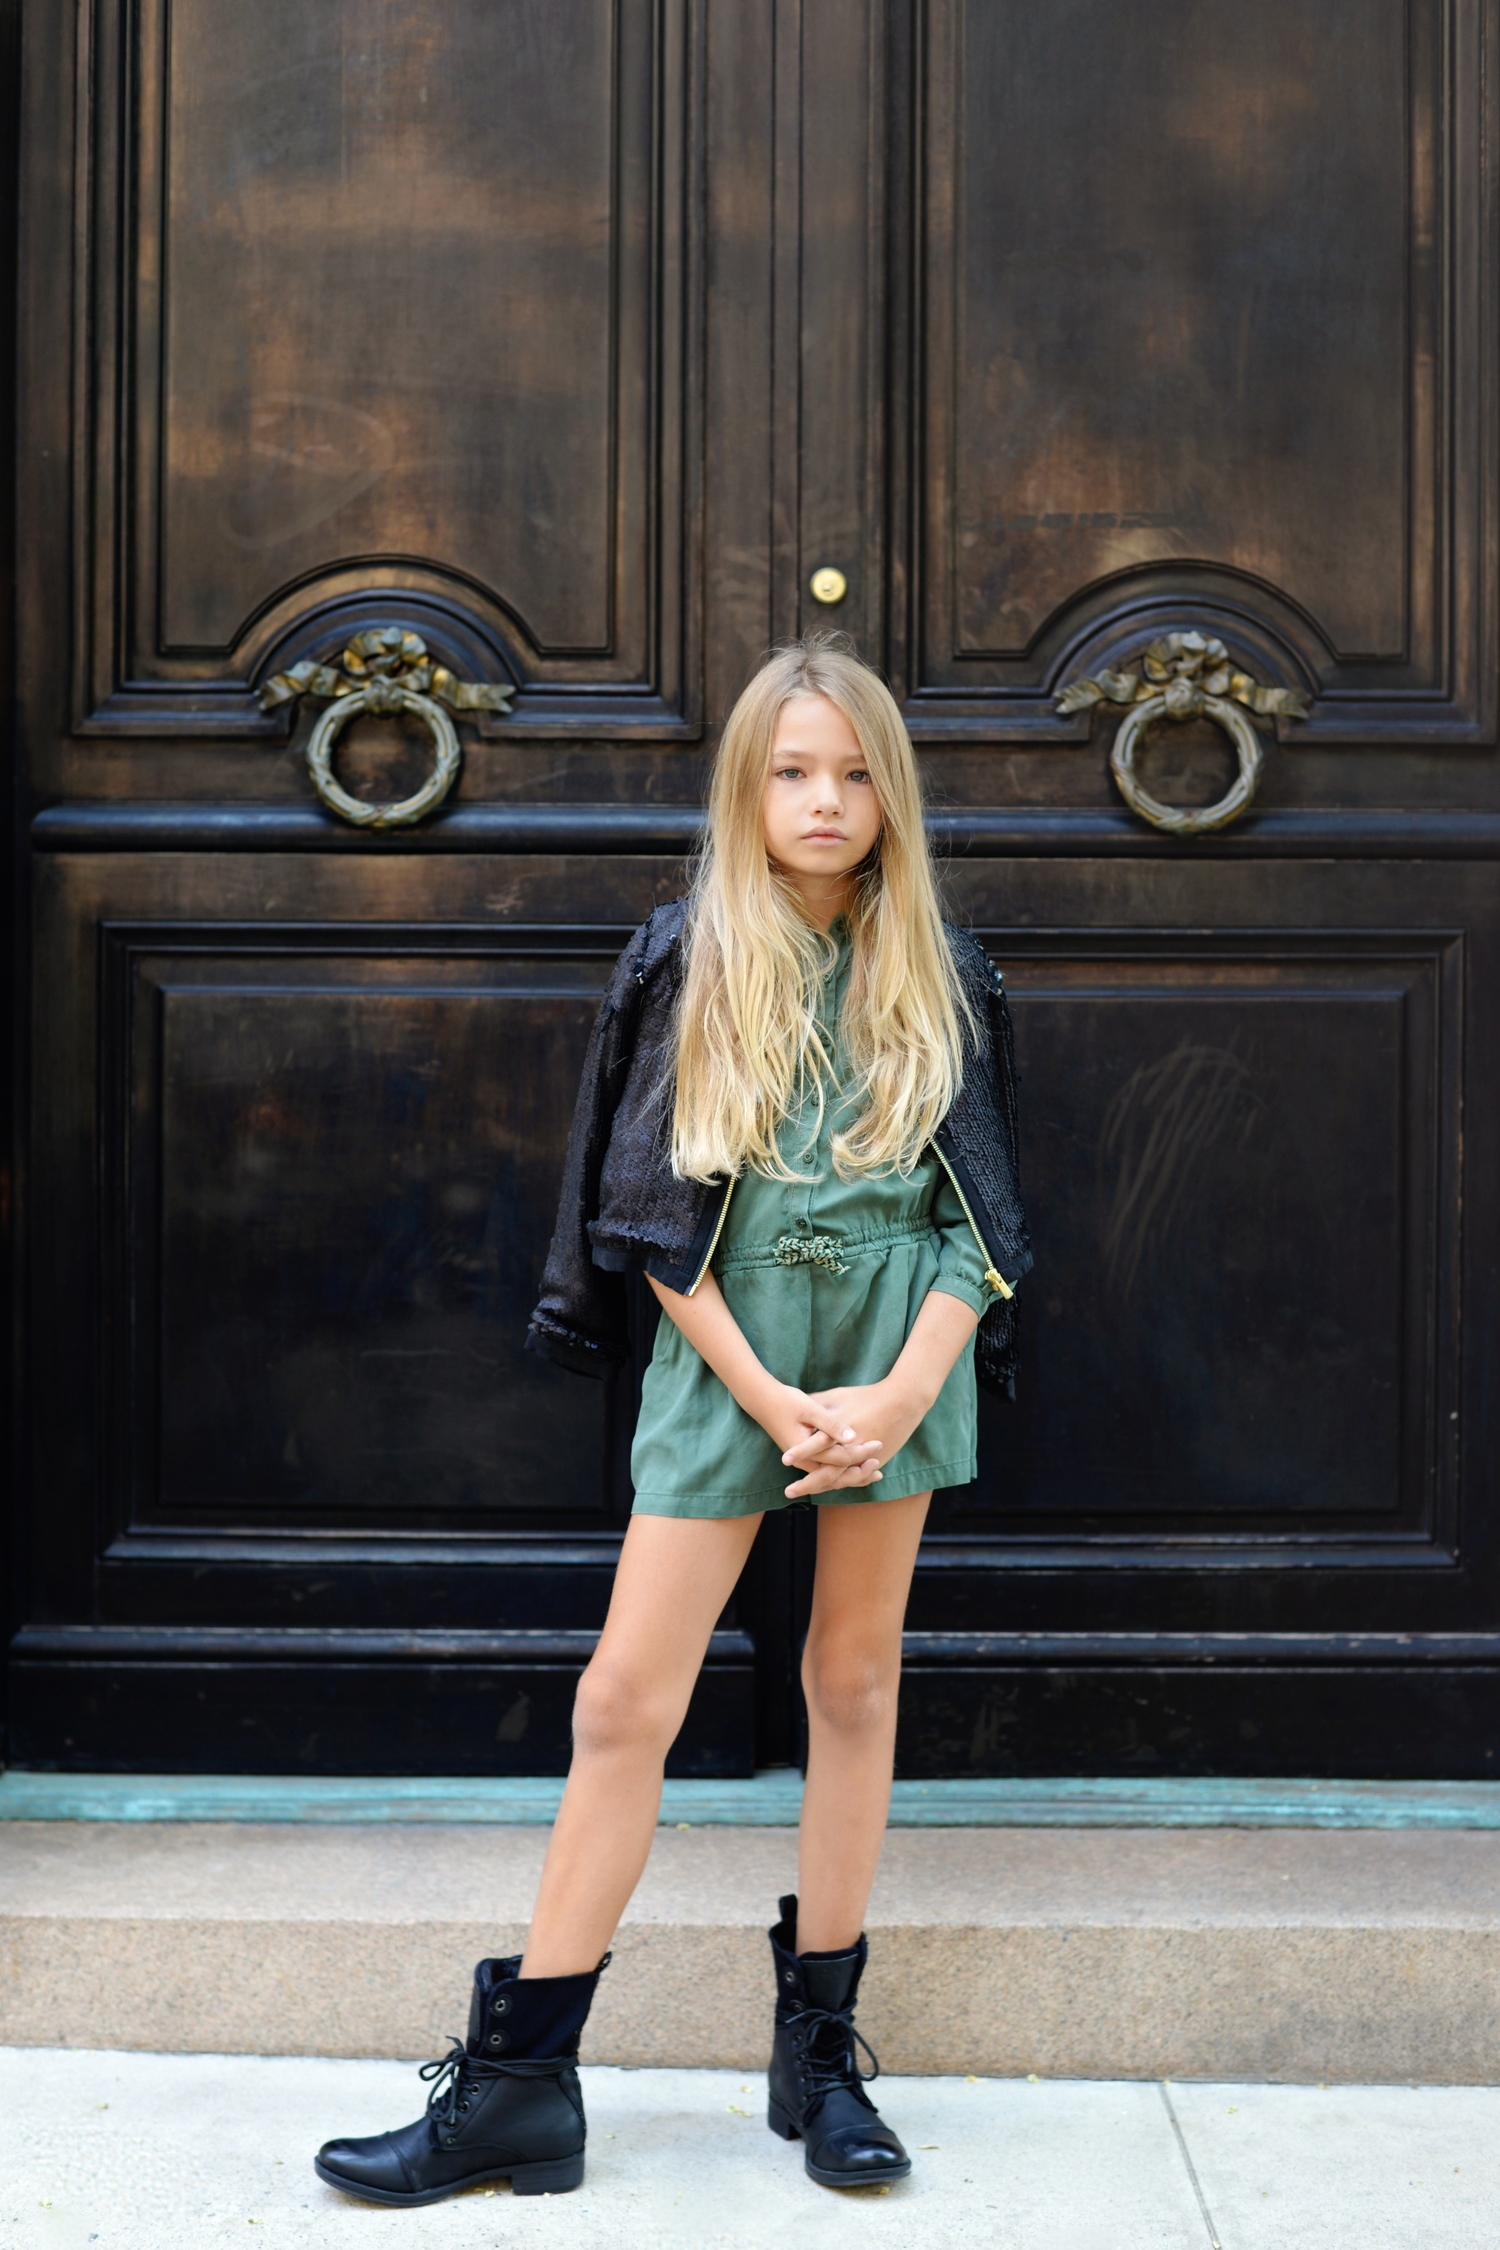 Enfant+Street+Style+by+Gina+Kim+Photography-59.jpeg